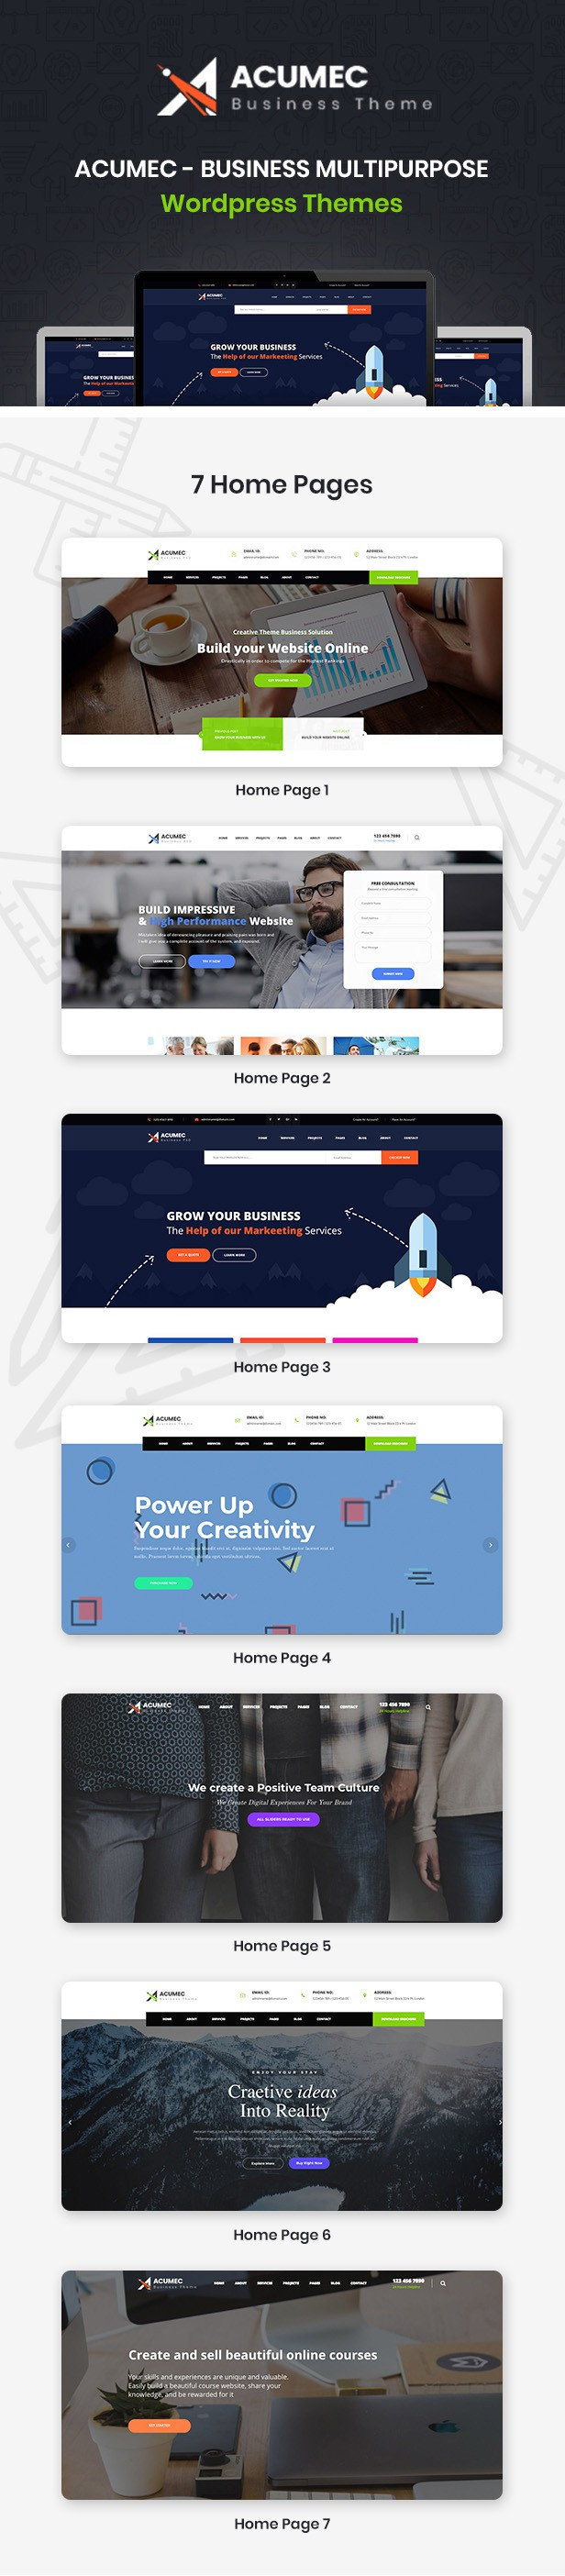 Acumec - Business Mehrzweck WordPress Theme - 10